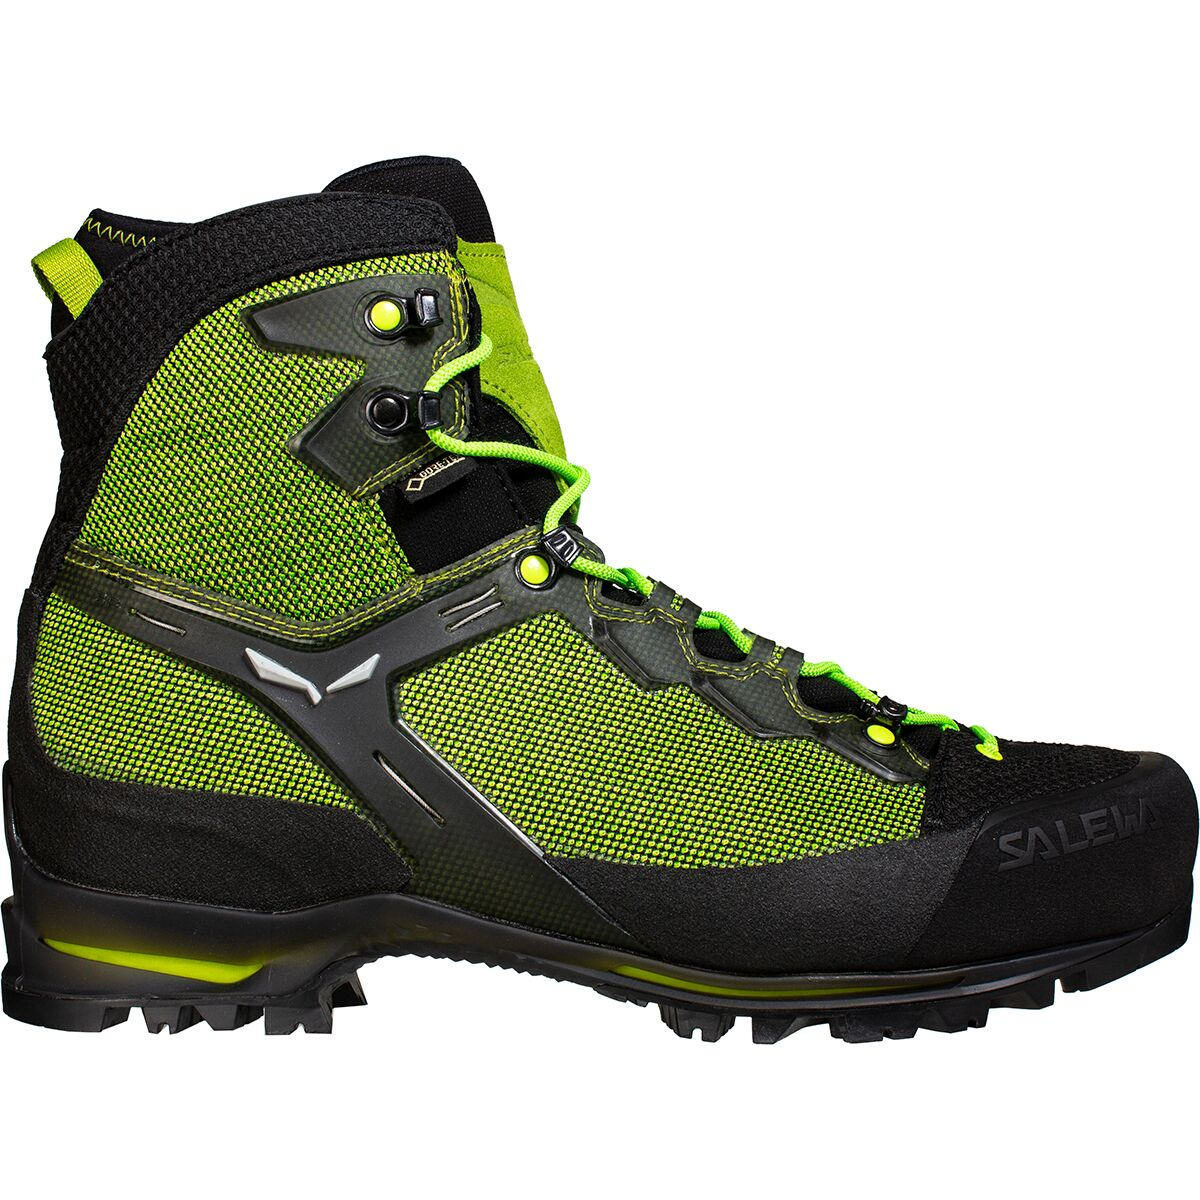 photo: Salewa Raven 3 GTX mountaineering boot